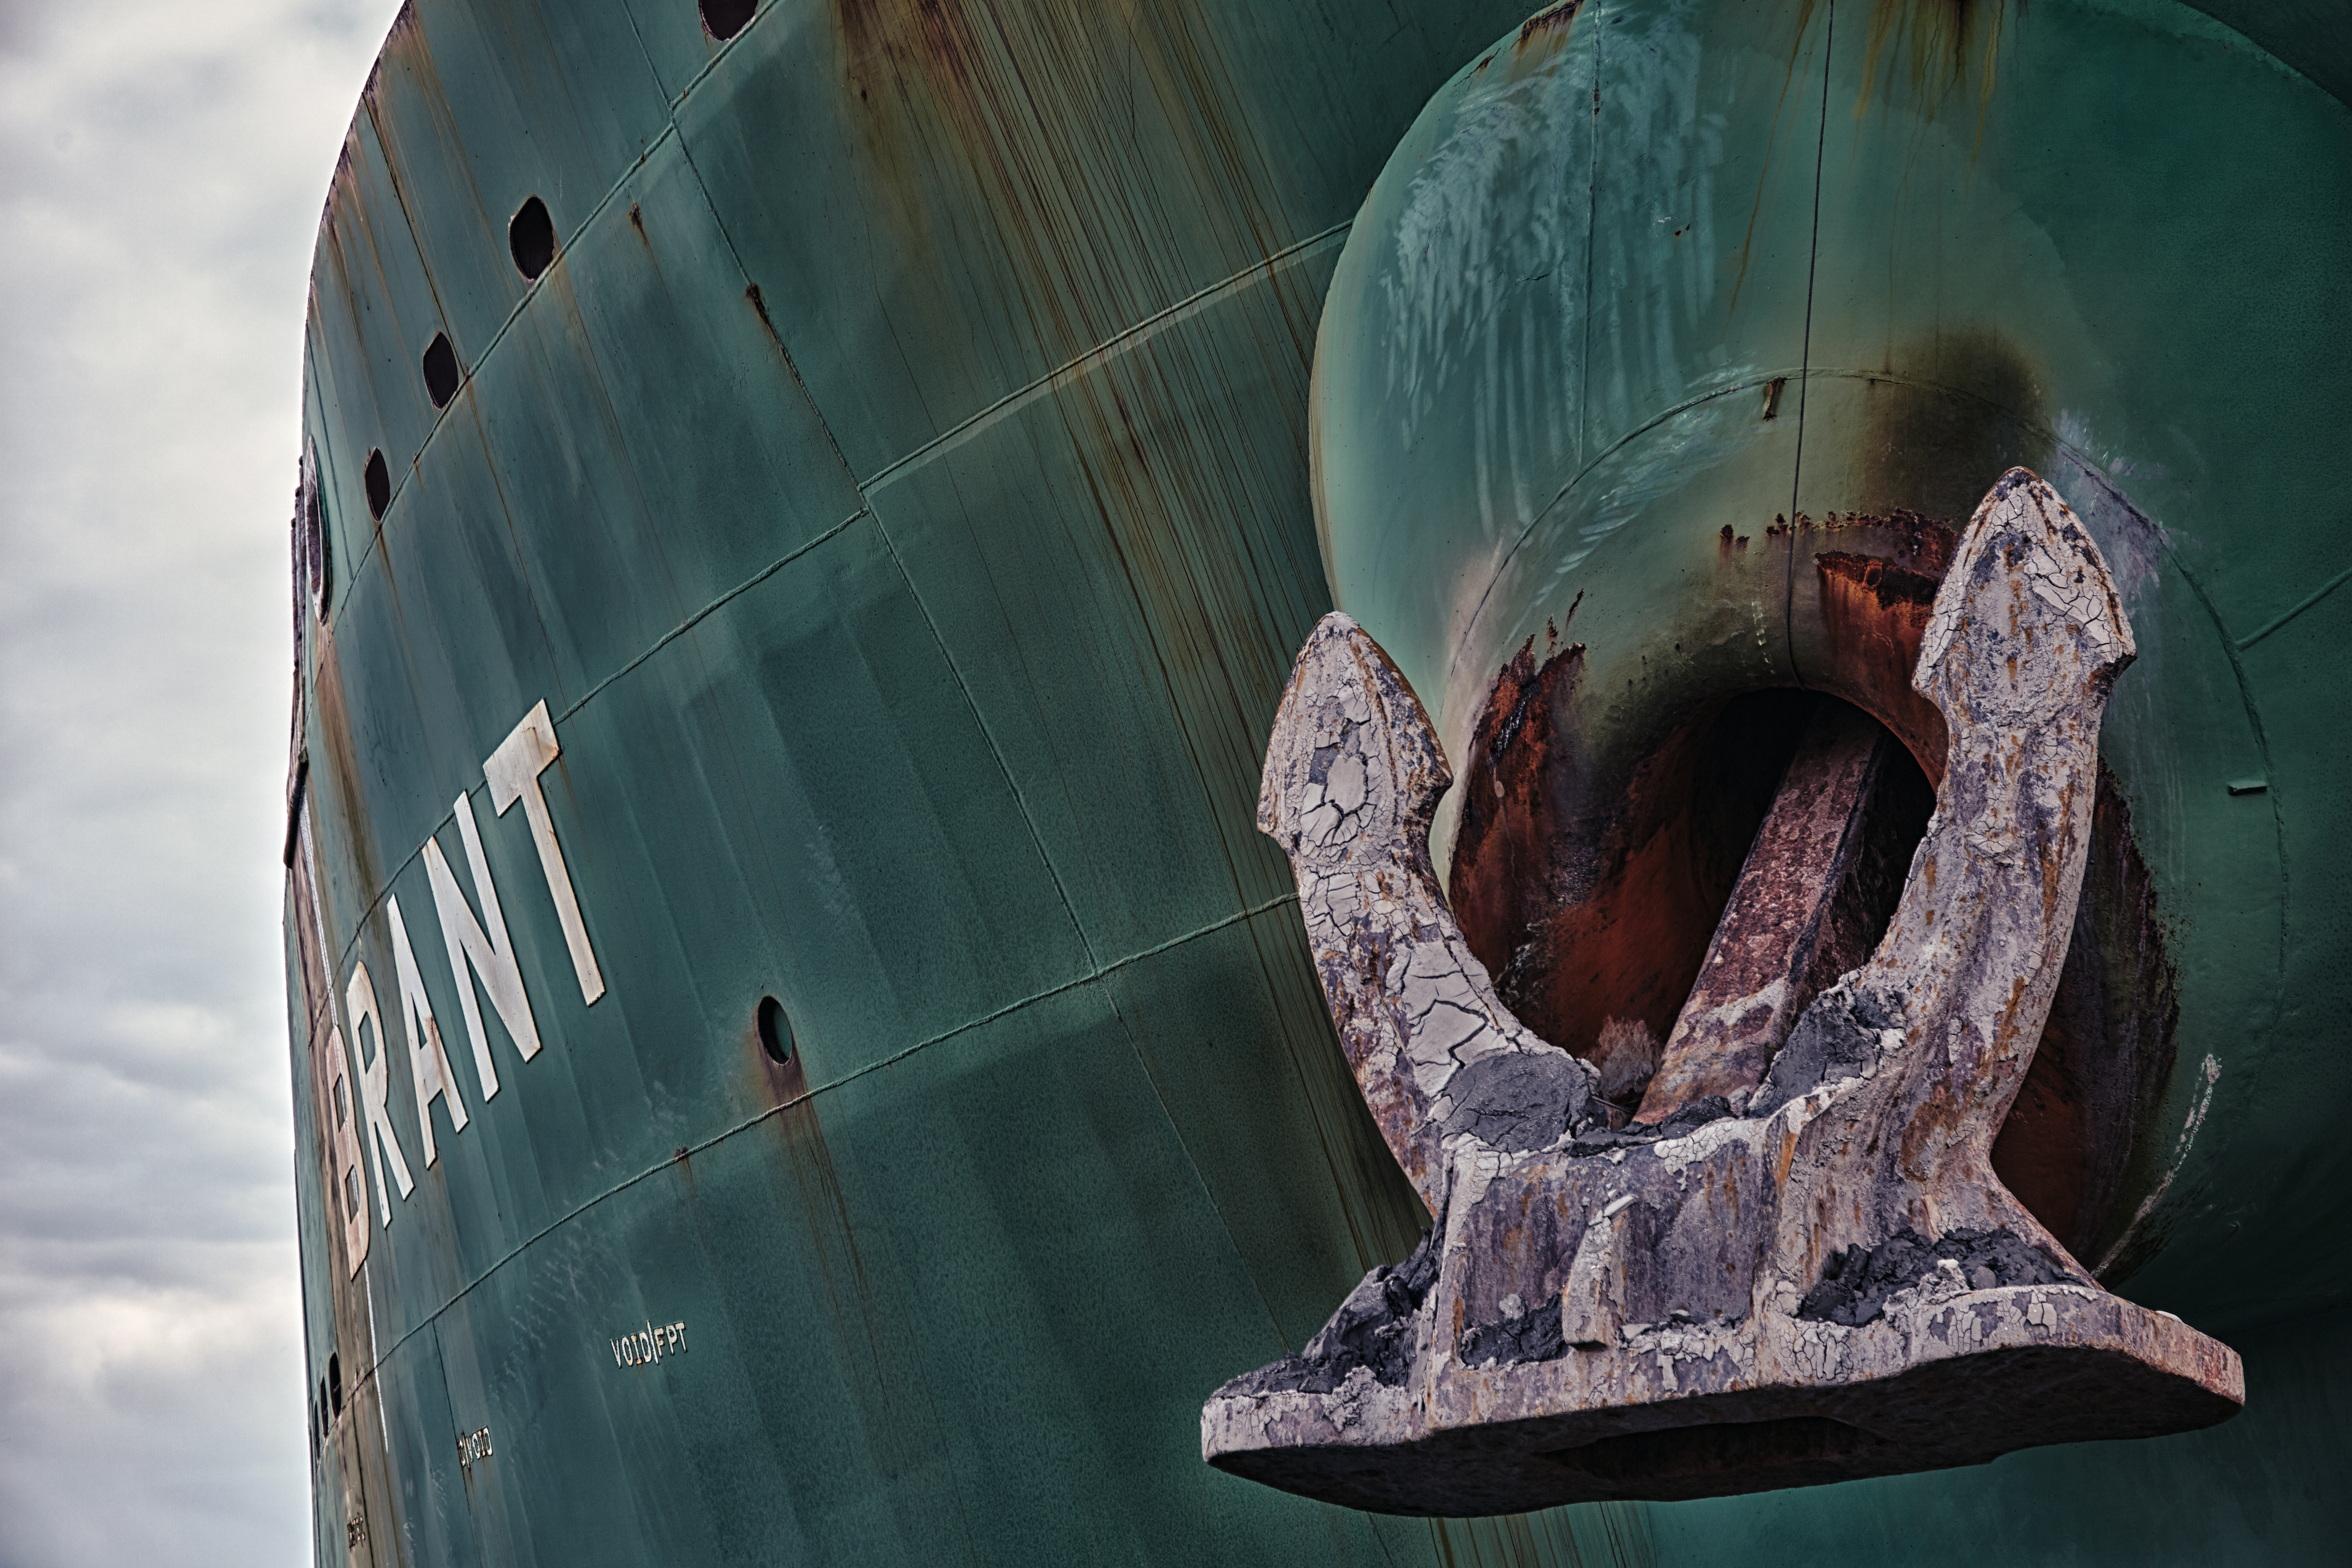 Cruise, Giant, Heavy, Metal, Rust, HQ Photo